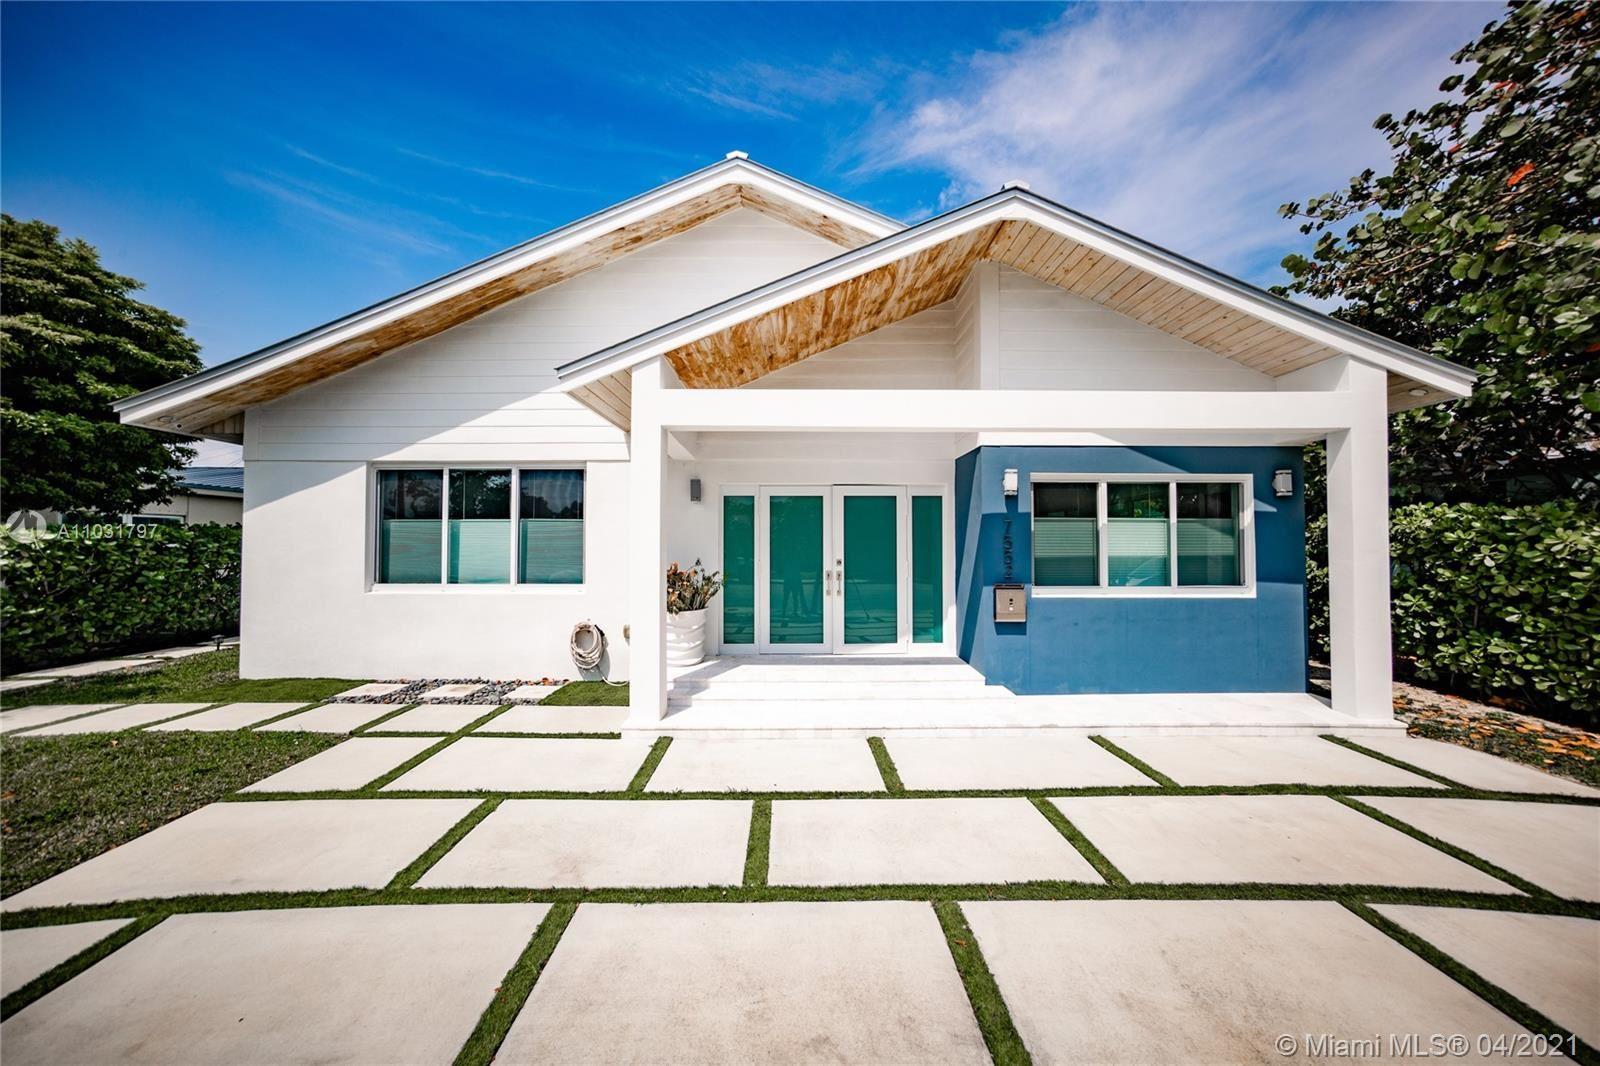 7552 Cutlass Ave, North Bay Village, FL 33141 - #: A11031797